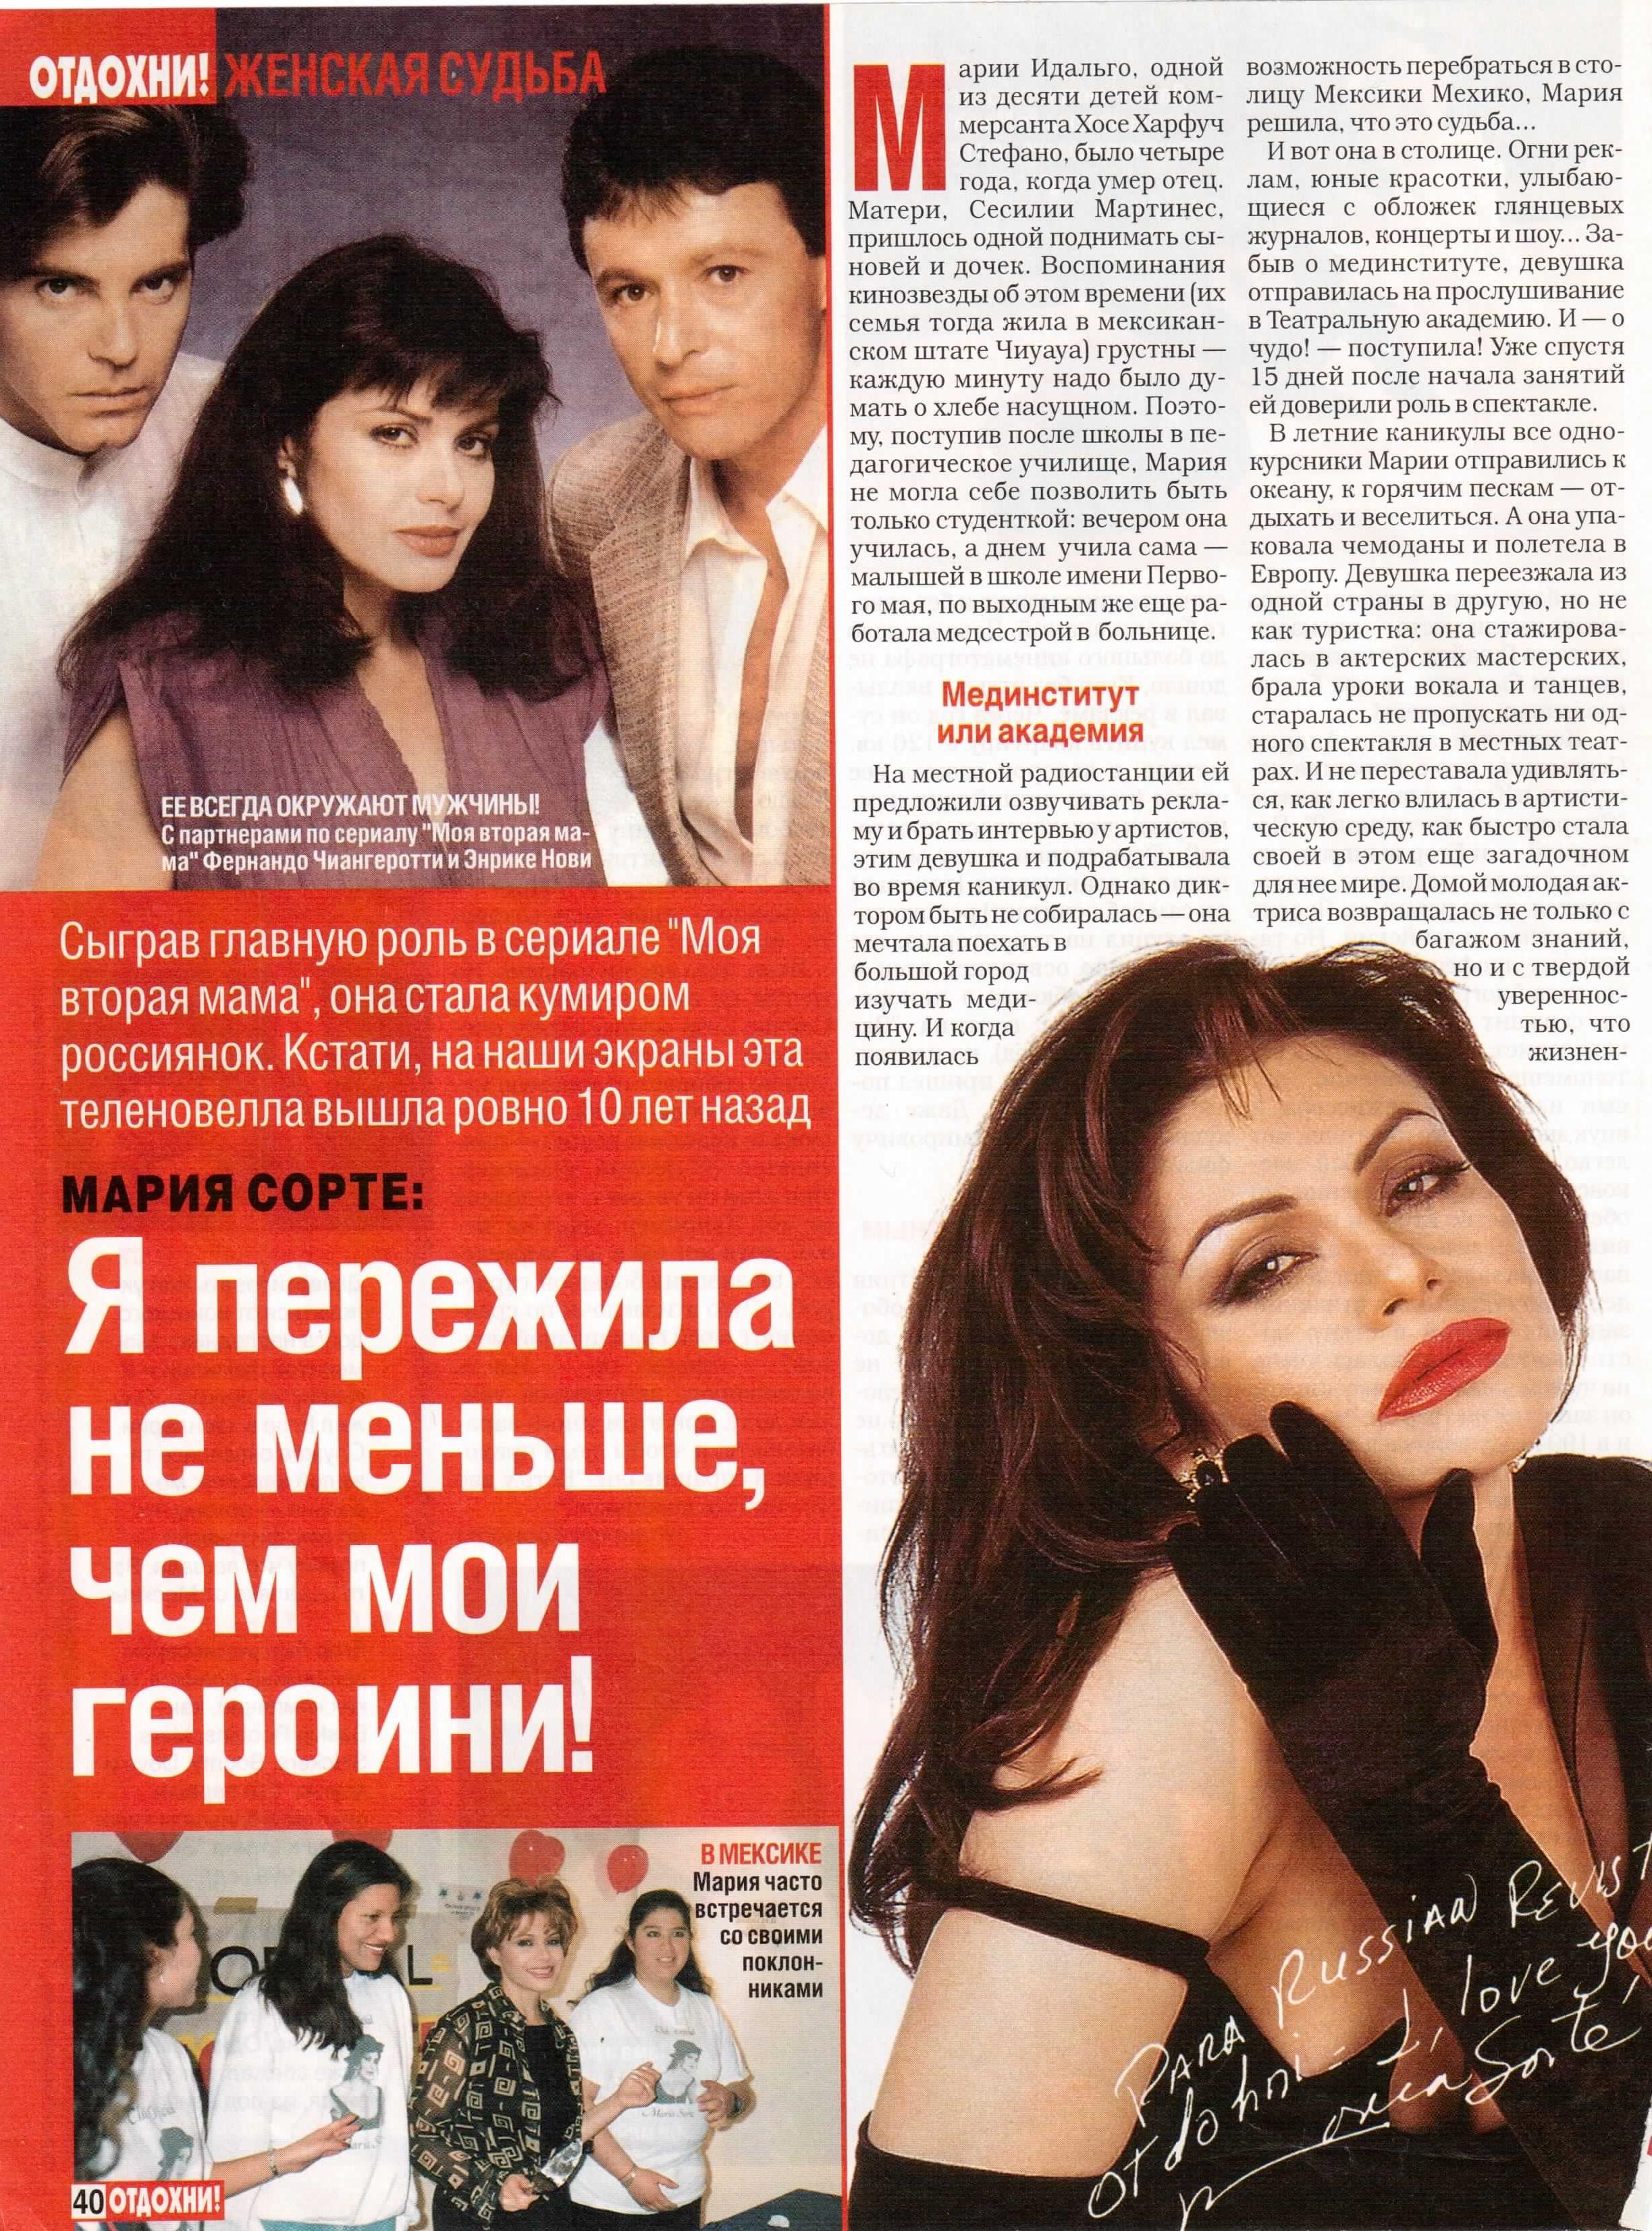 http://s1.uploads.ru/i/ohOqi.jpg